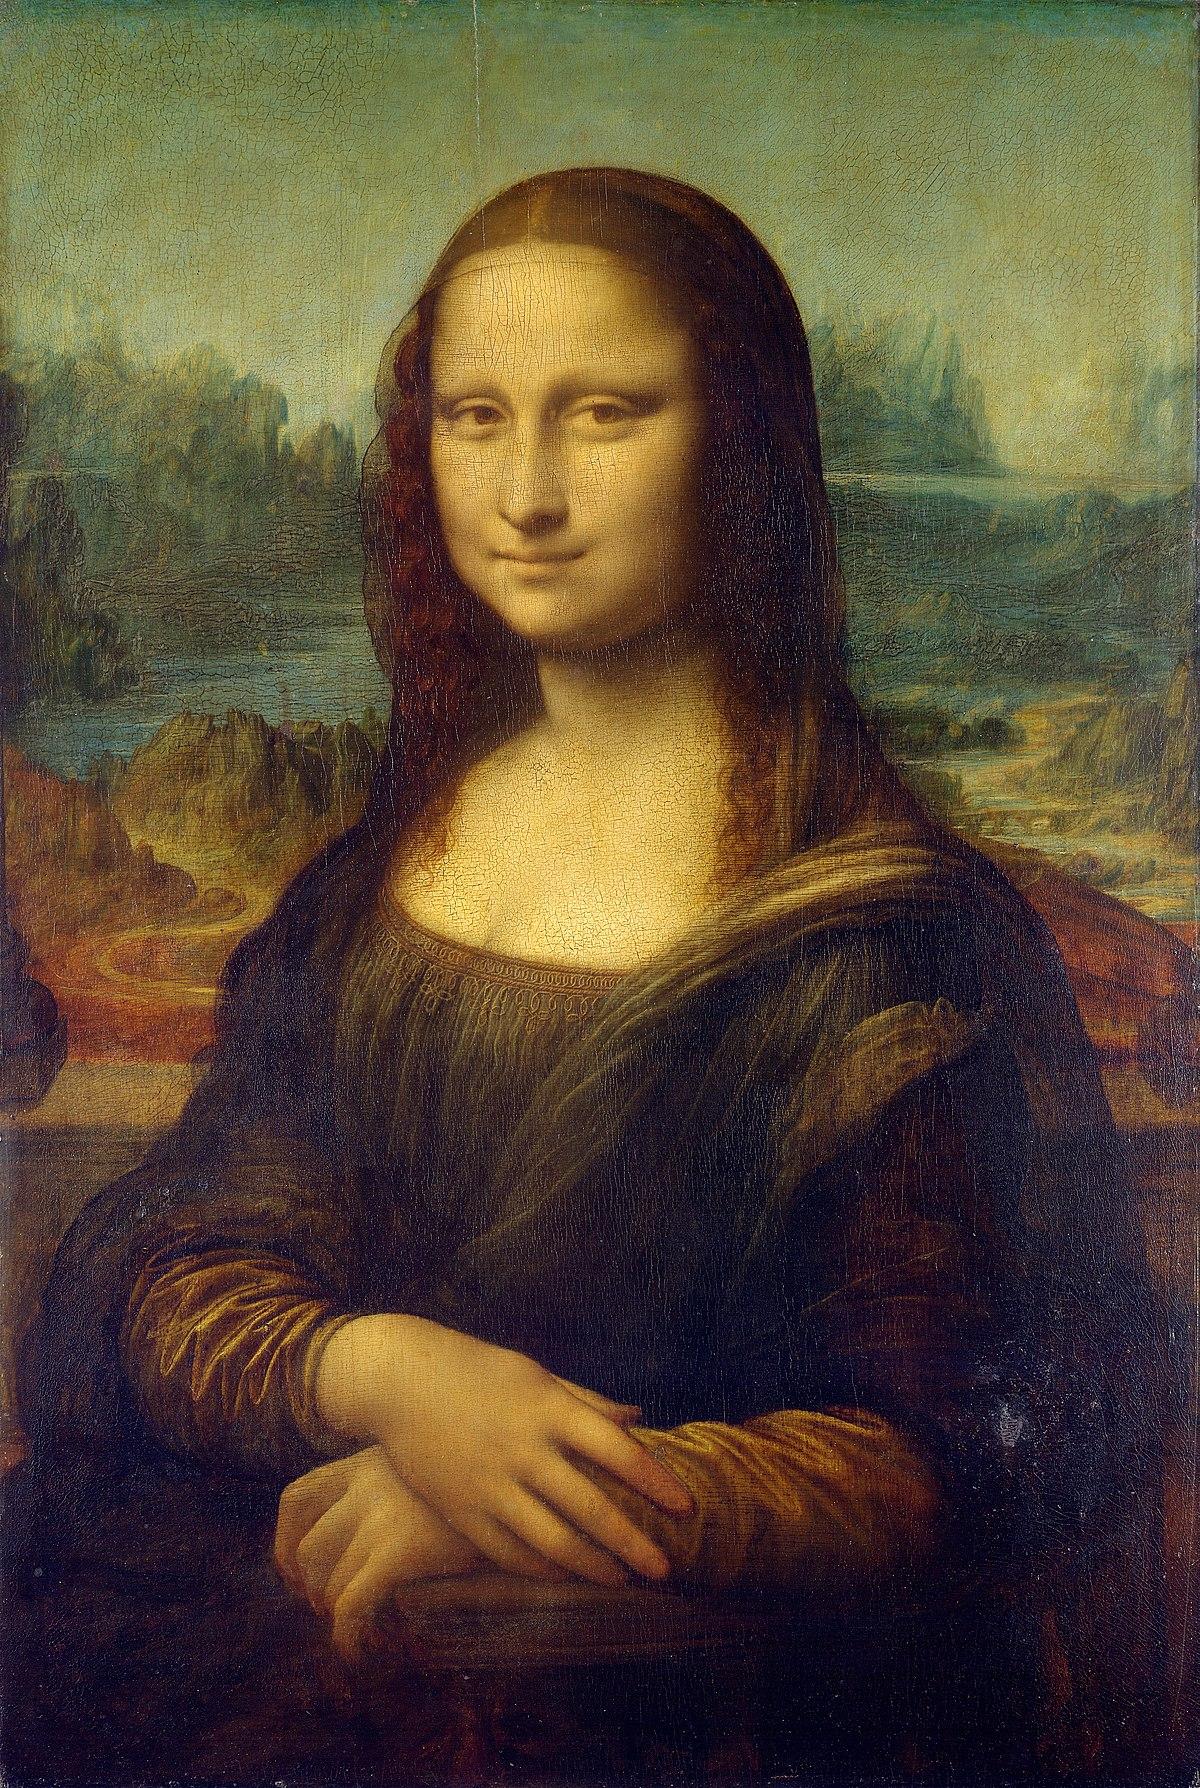 1200px-Mona_Lisa,_by_Leonardo_da_Vinci,_from_C2RMF_retouched.jpg